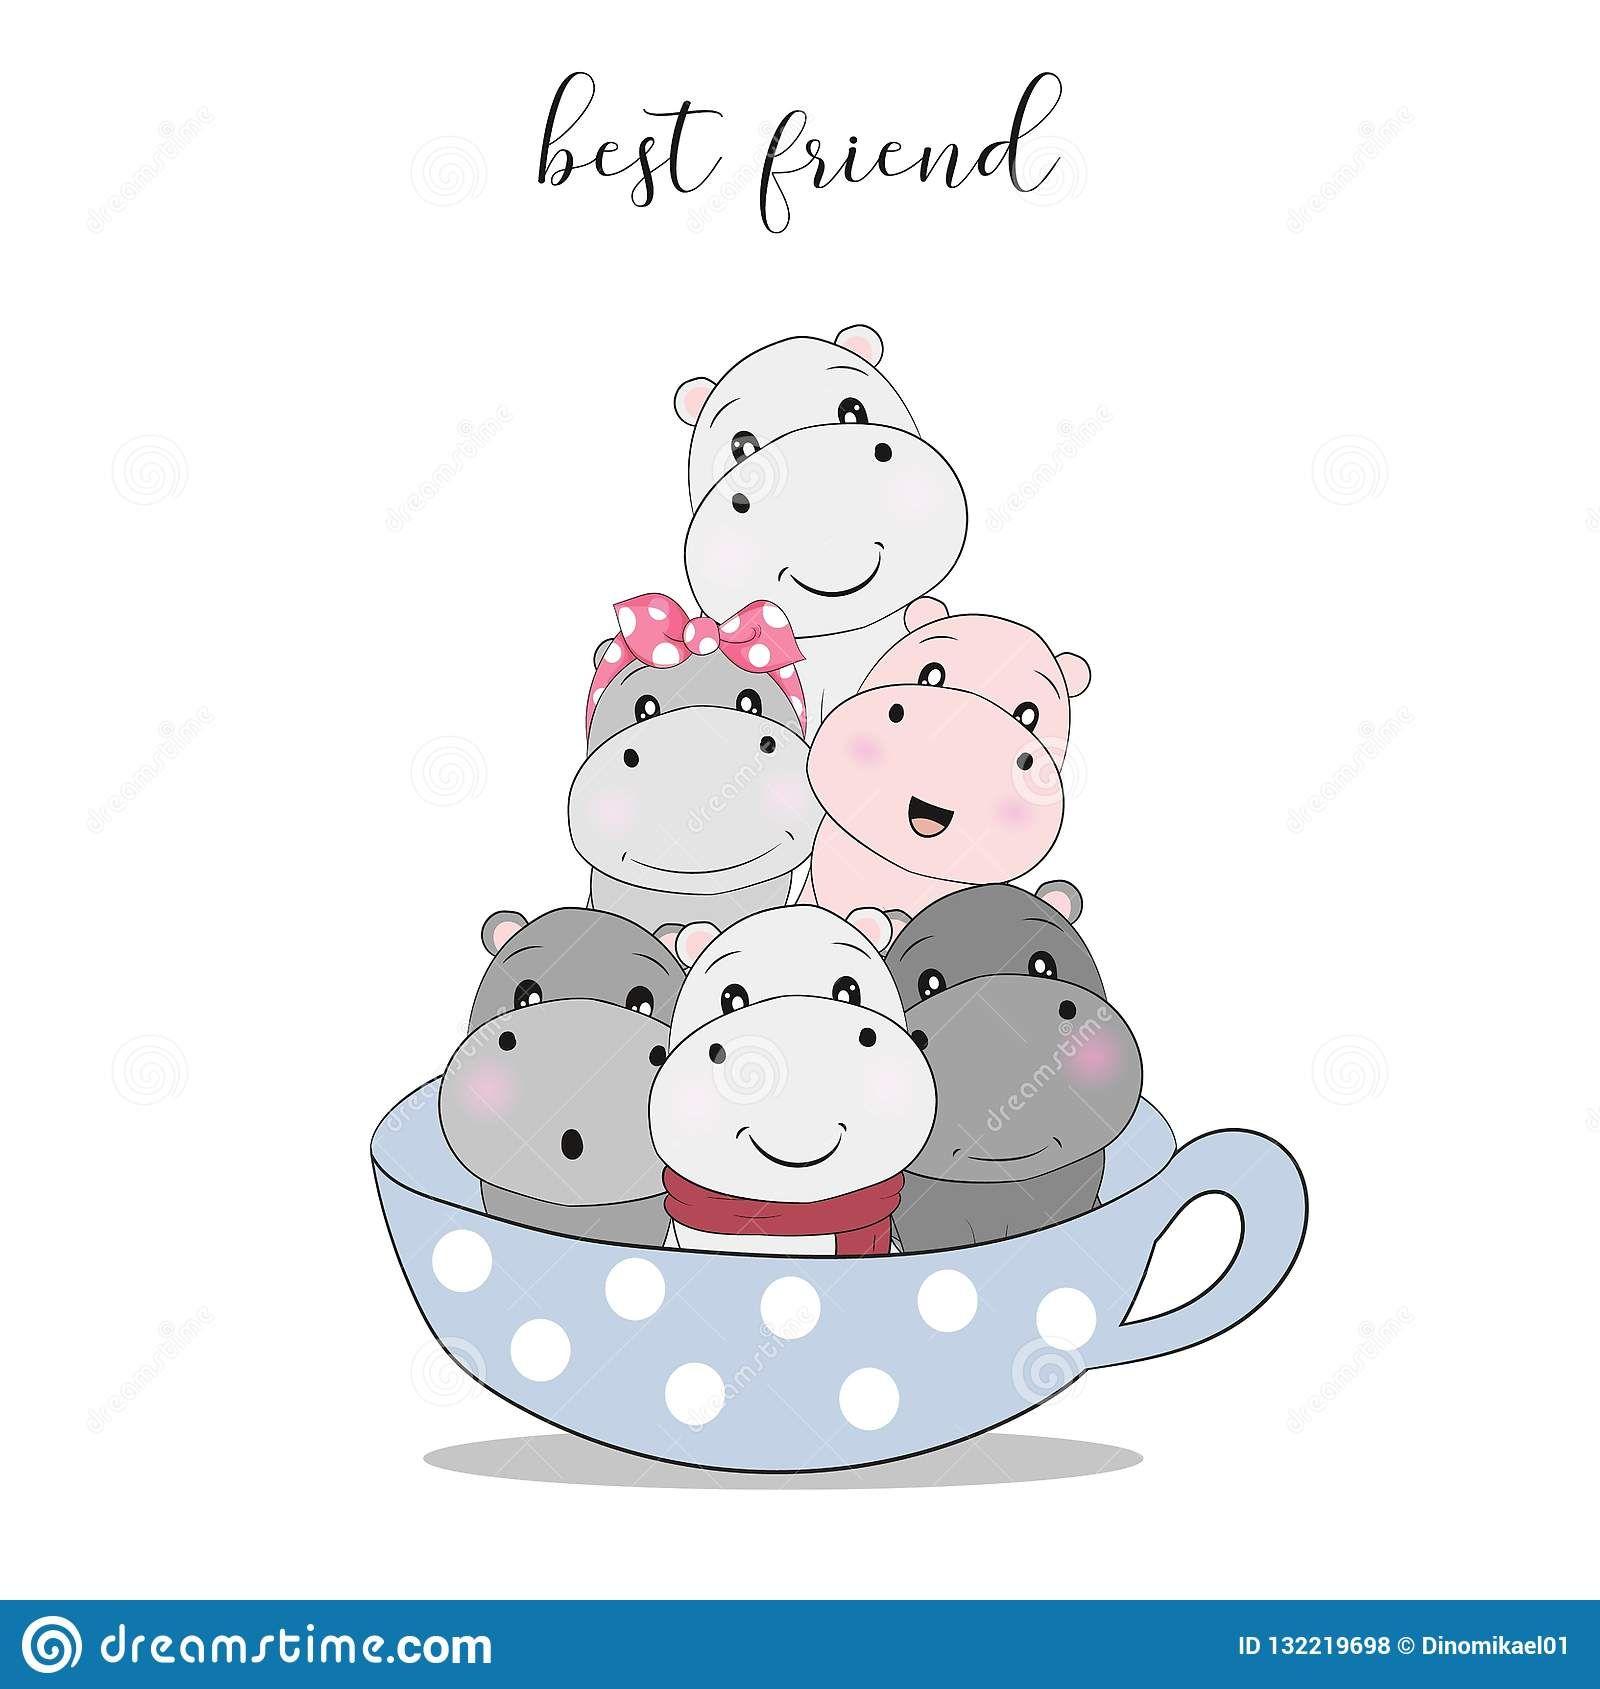 Cute Cartoon Hippo In Cup Tea Stock Vector Illustration Of Isolated Cartoon 132219698 Cartoon Hippo Hippo Drawing Cute Doodles